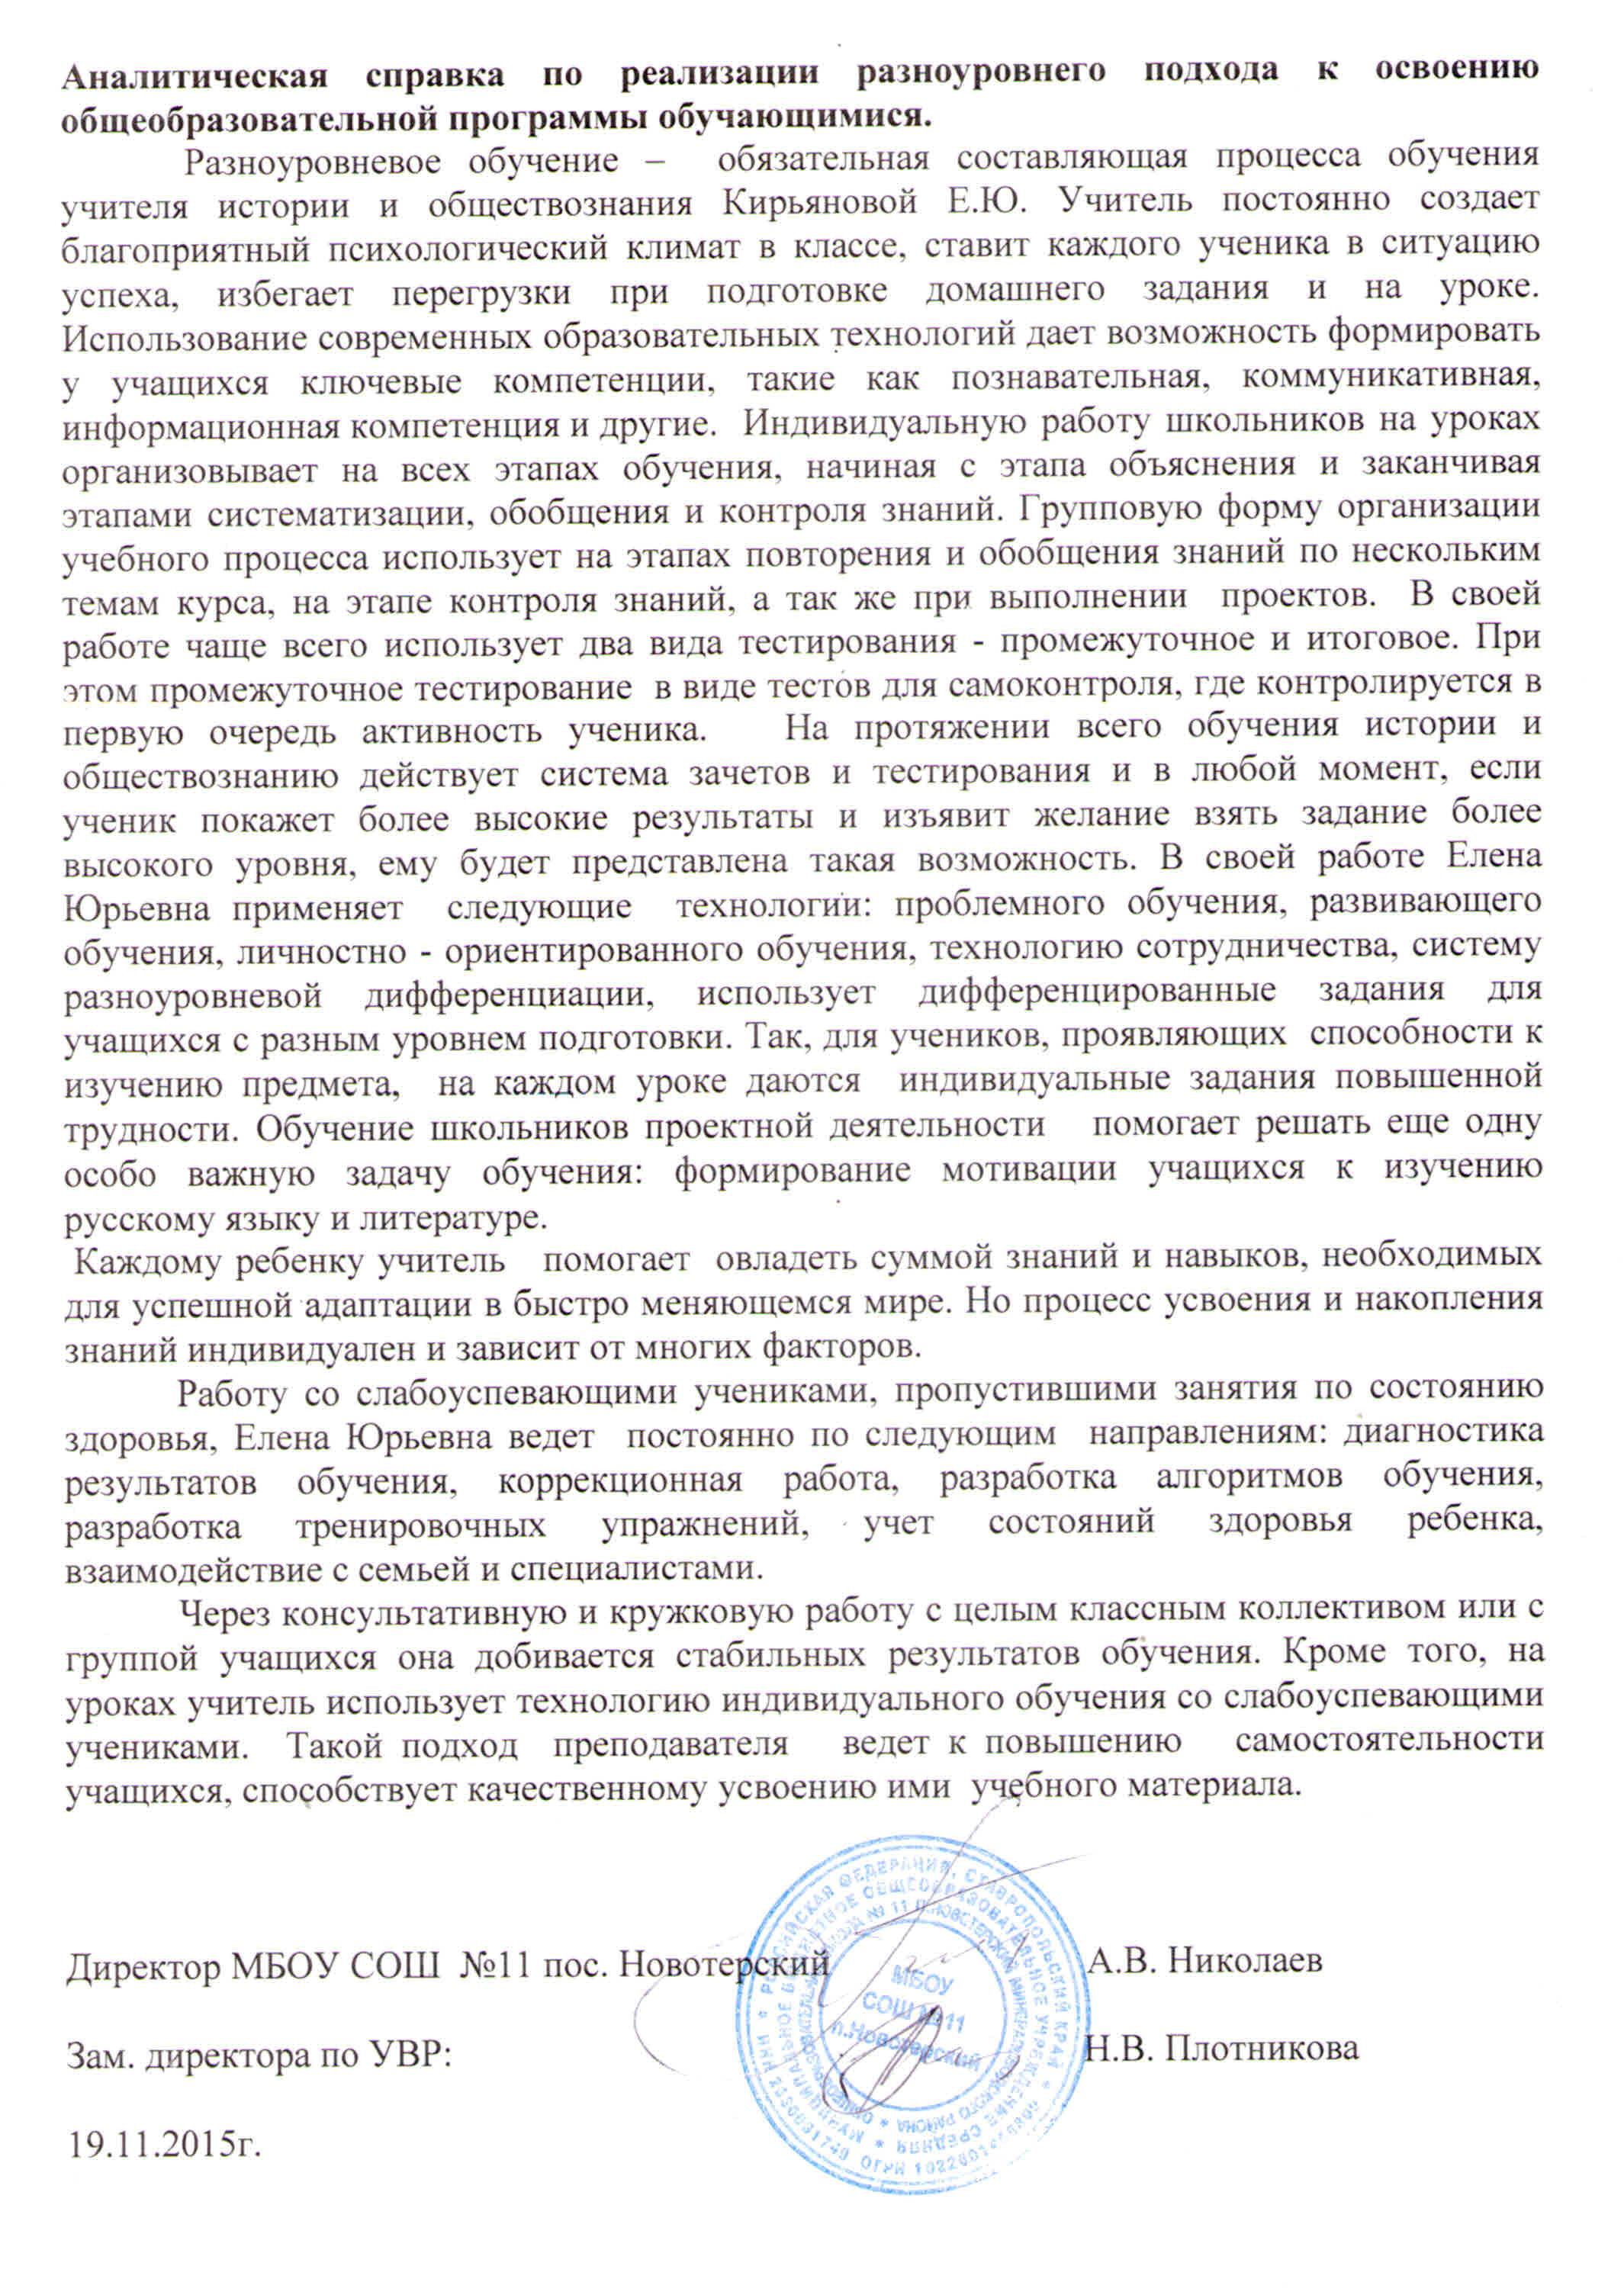 C:\Users\Сергей\Desktop\аналитсправка\Document_17.jpg